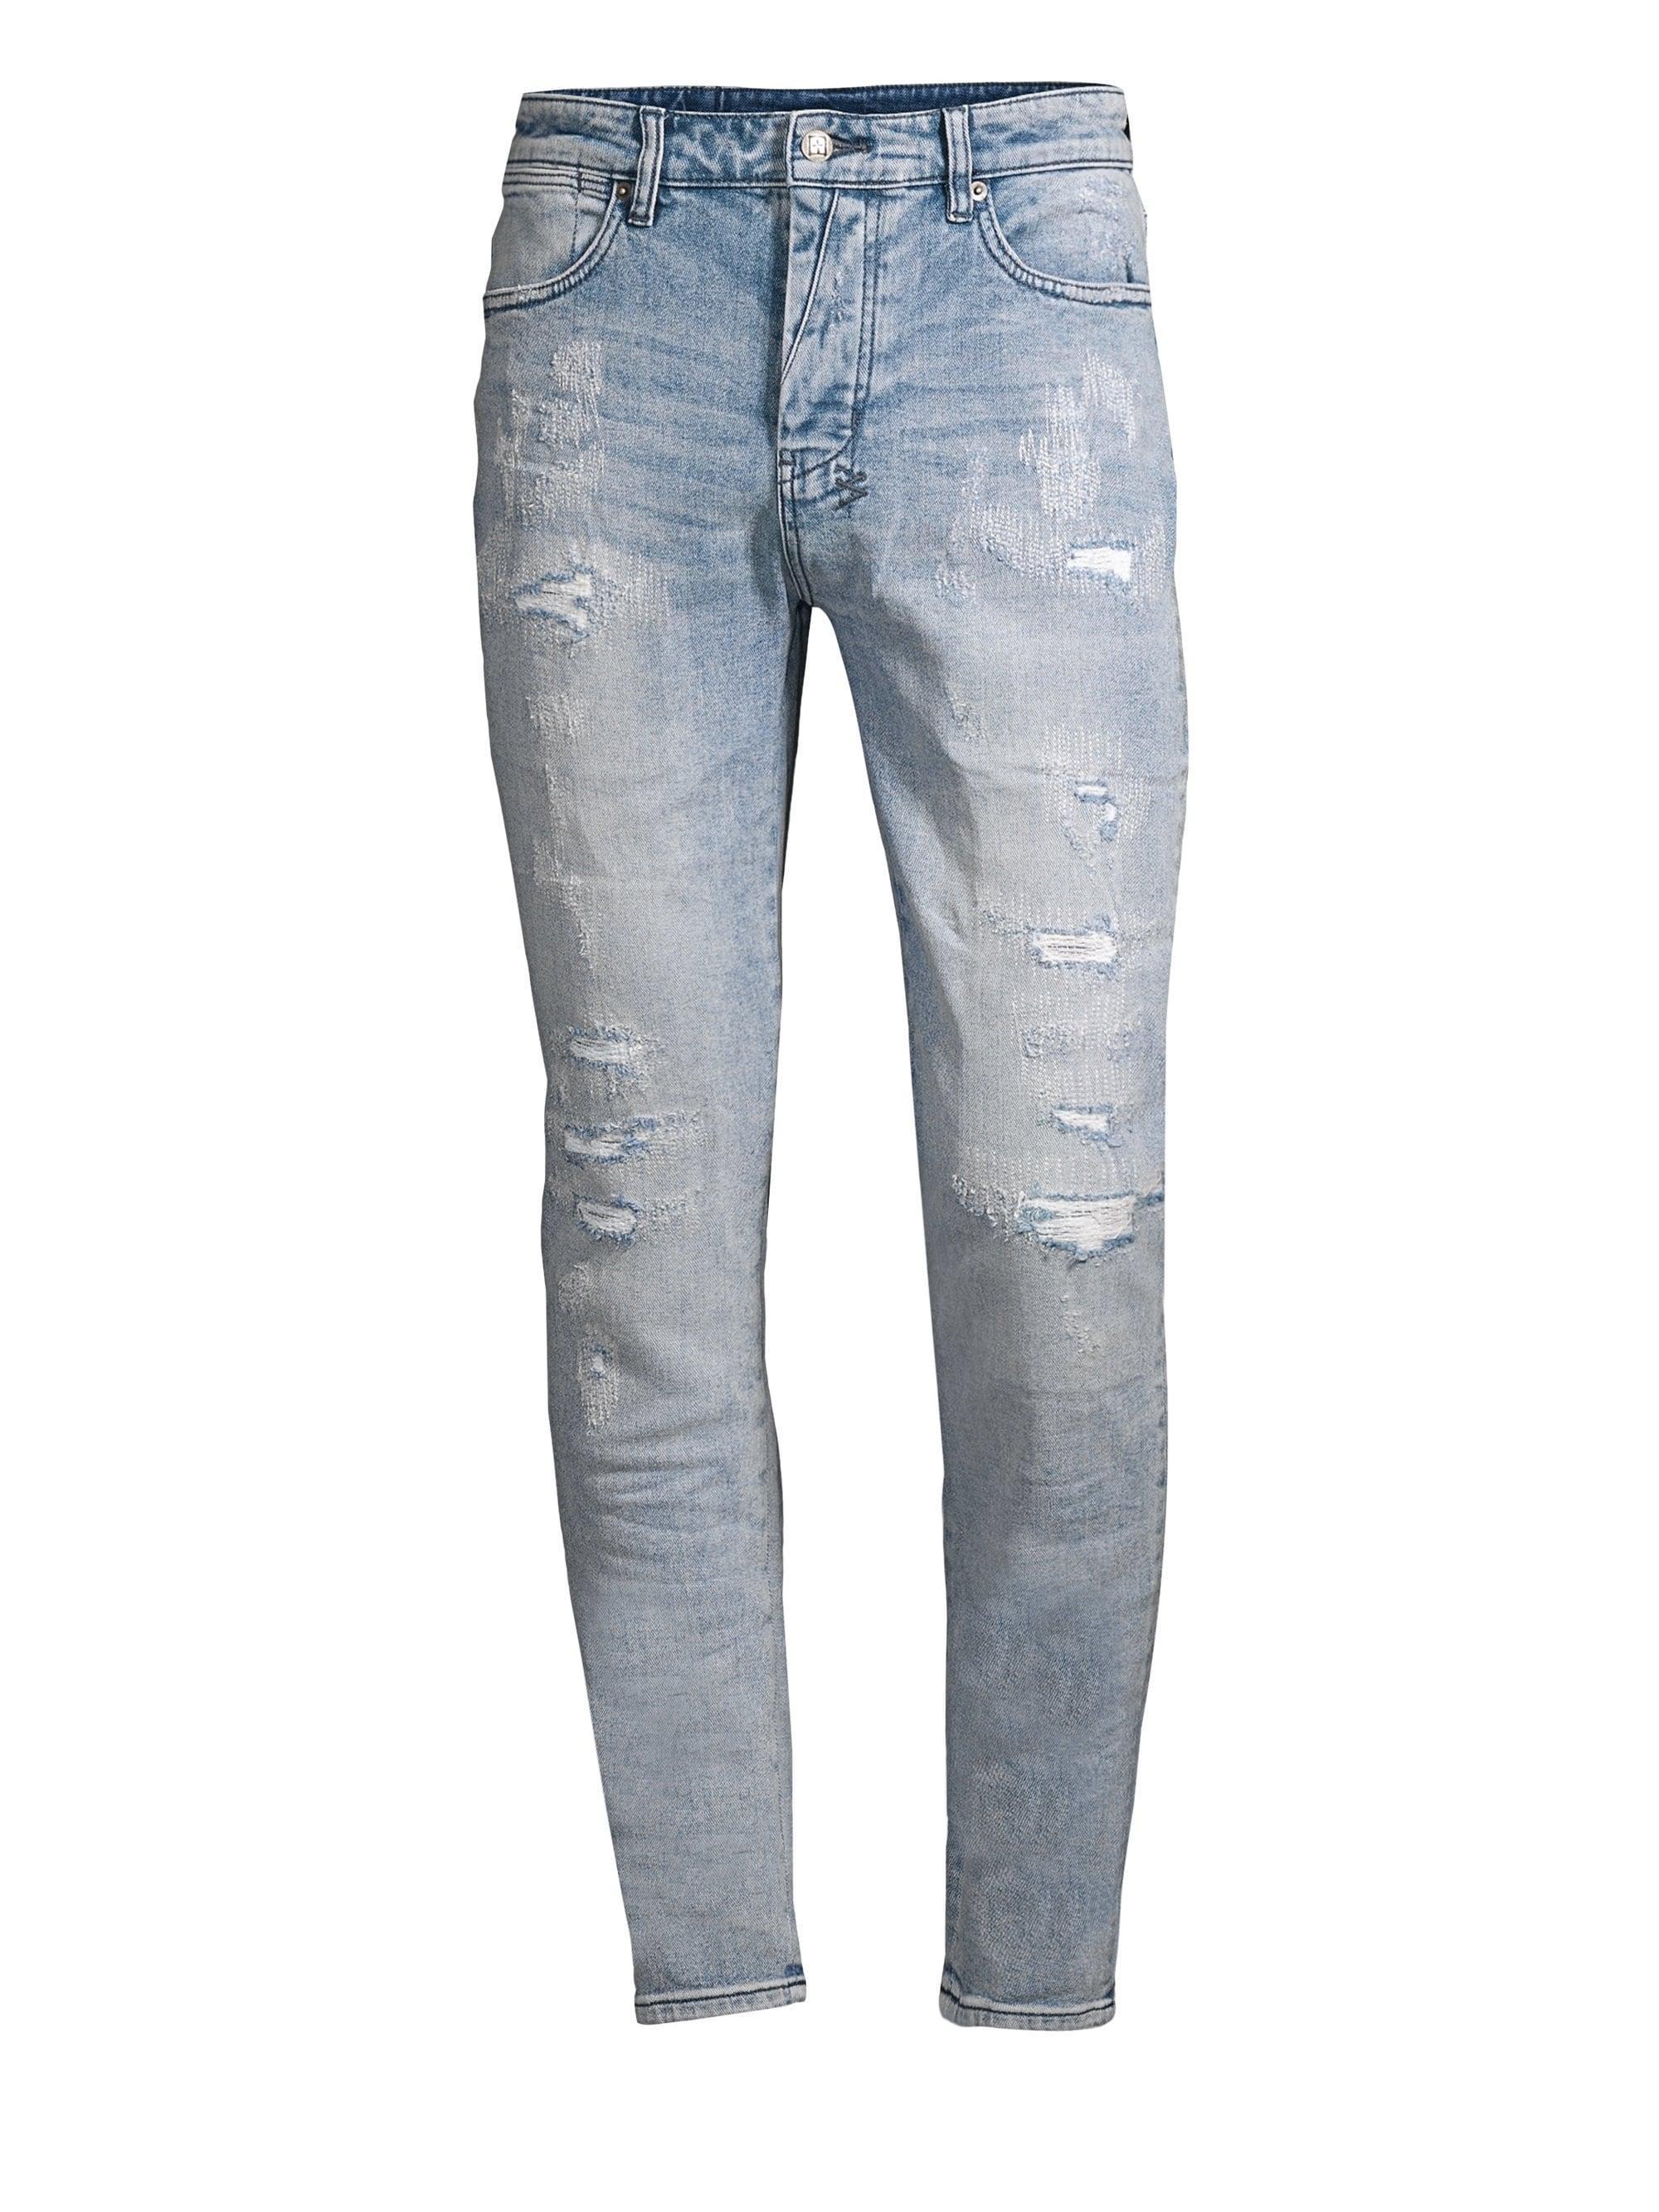 19ecdb6b4432 Ksubi Men's Van Winkle Hawker Skinny Jeans - Denim in Blue for Men ...